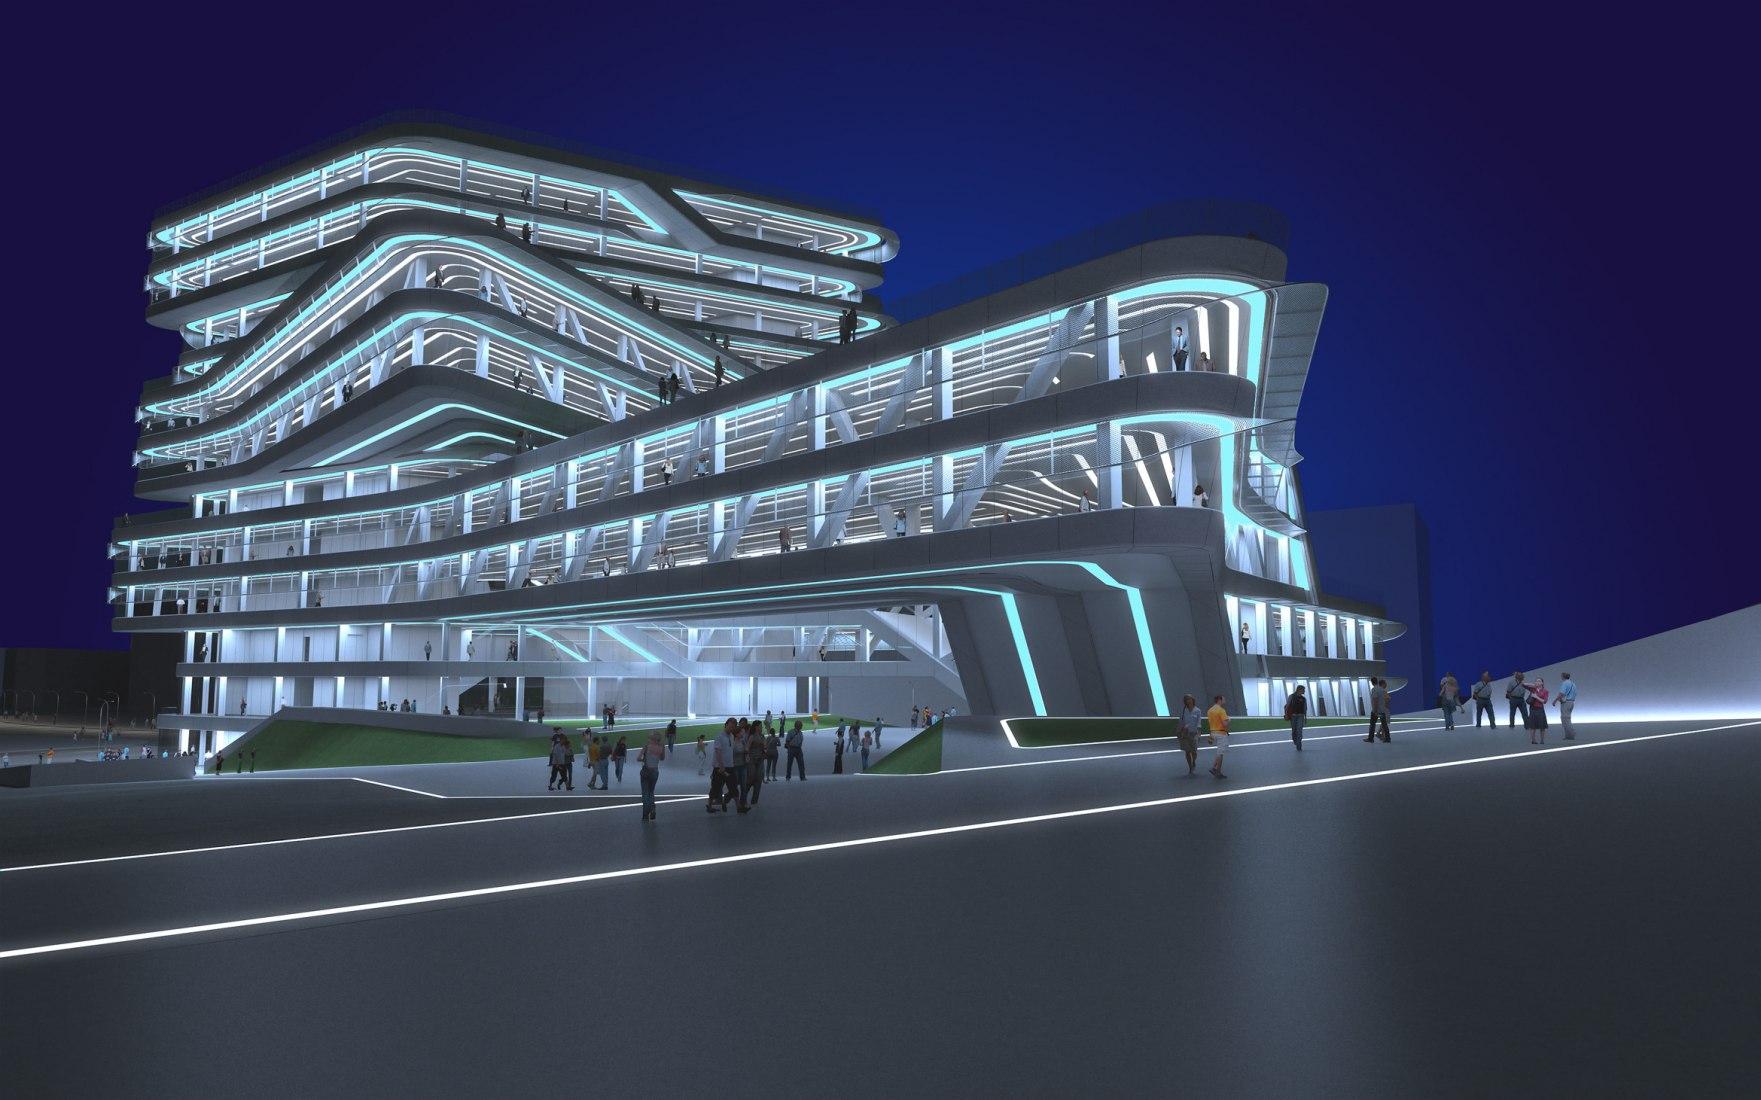 Project of the building under construction Espiral Tower, of Barcelona, of Zaha Hadid. ZAHA HADID.